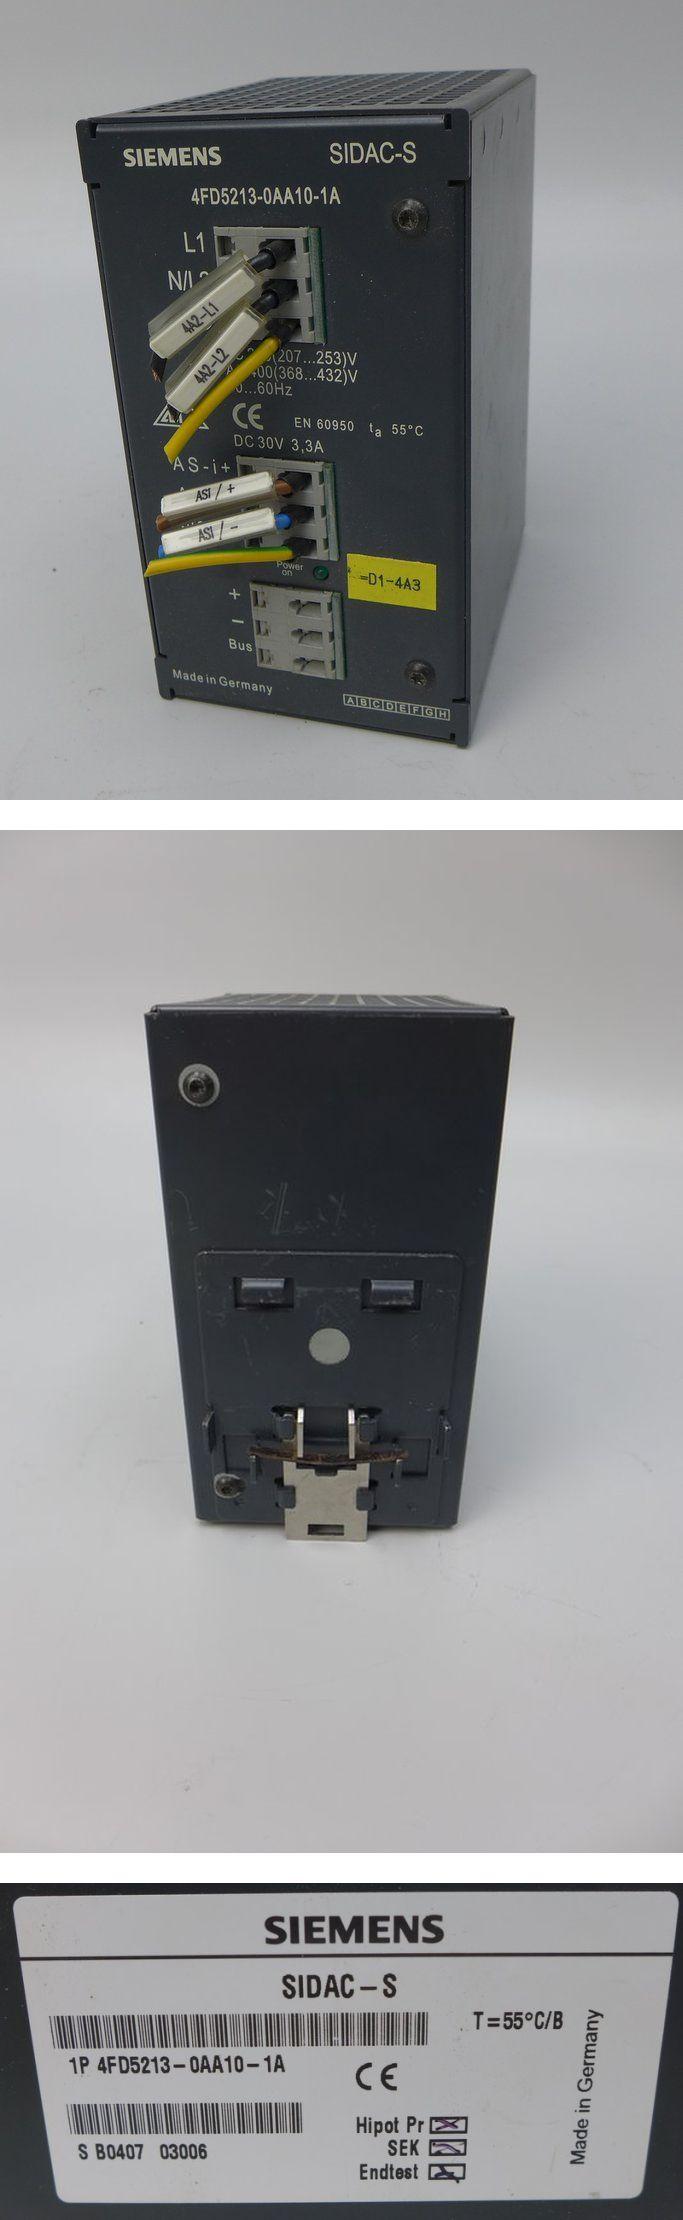 Siemens Sidac-S 4FD5213-0AA10-1A